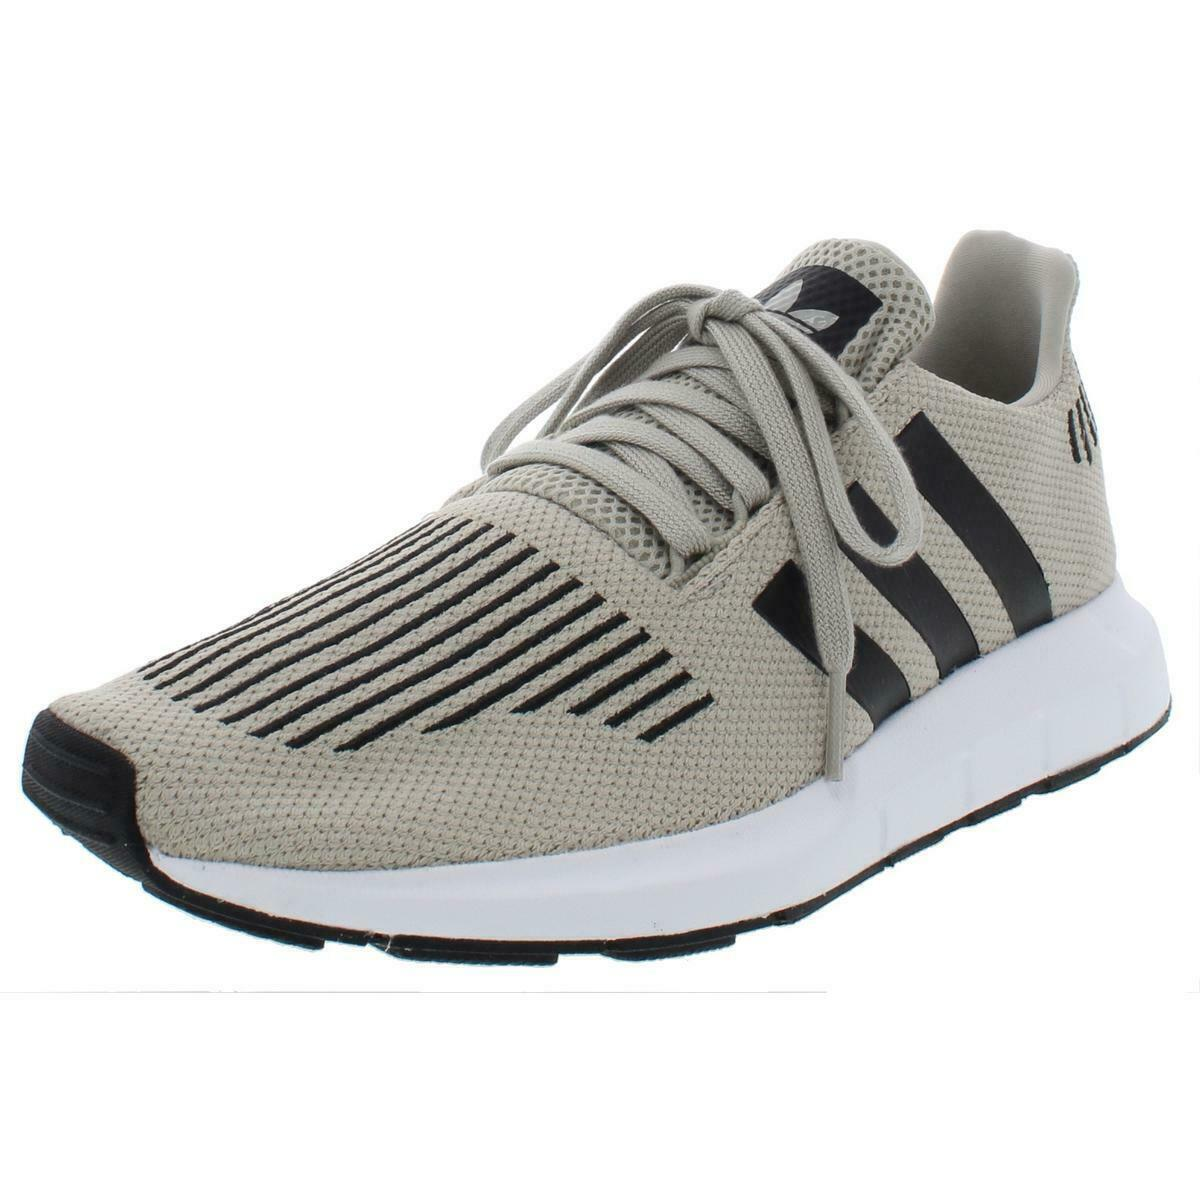 Adidas Originals Originals Originals Mens Swift Run Knit Running Athletic scarpe scarpe da ginnastica BHFO 4404 b8b197